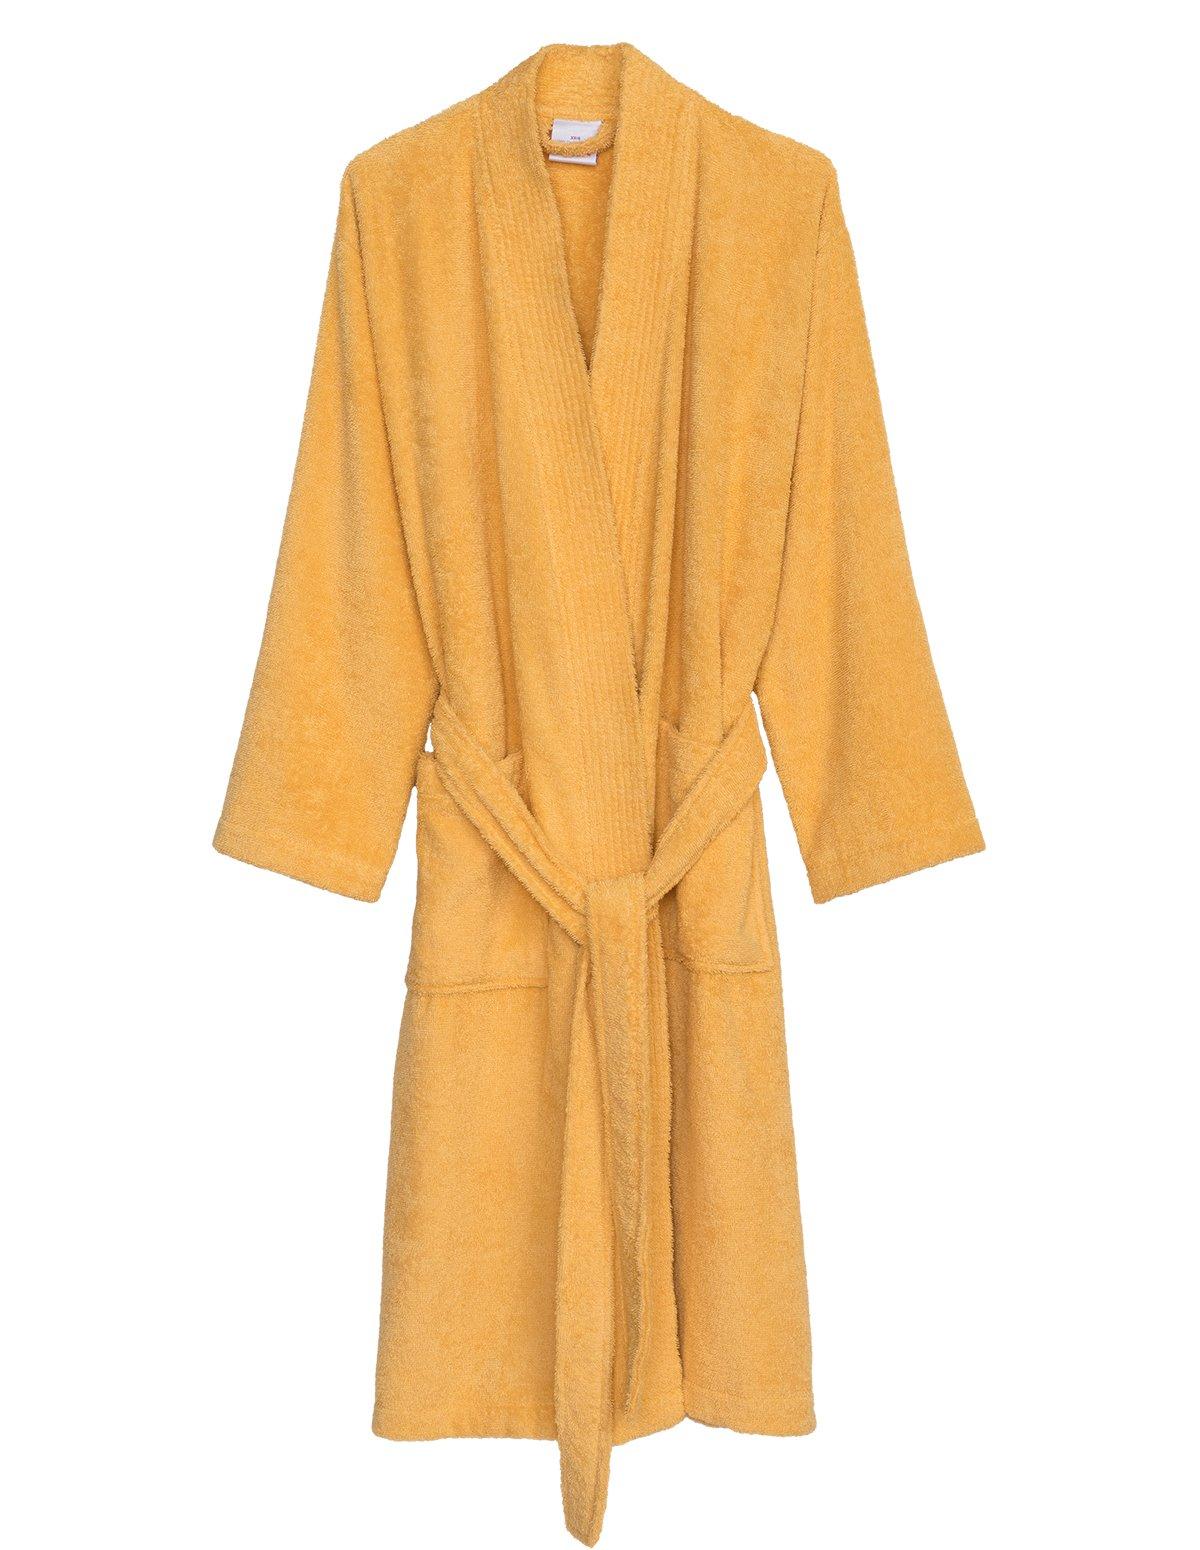 TowelSelections Women's Robe Turkish Cotton Terry Kimono Bathrobe X-Large/XX-Large Golden Cream